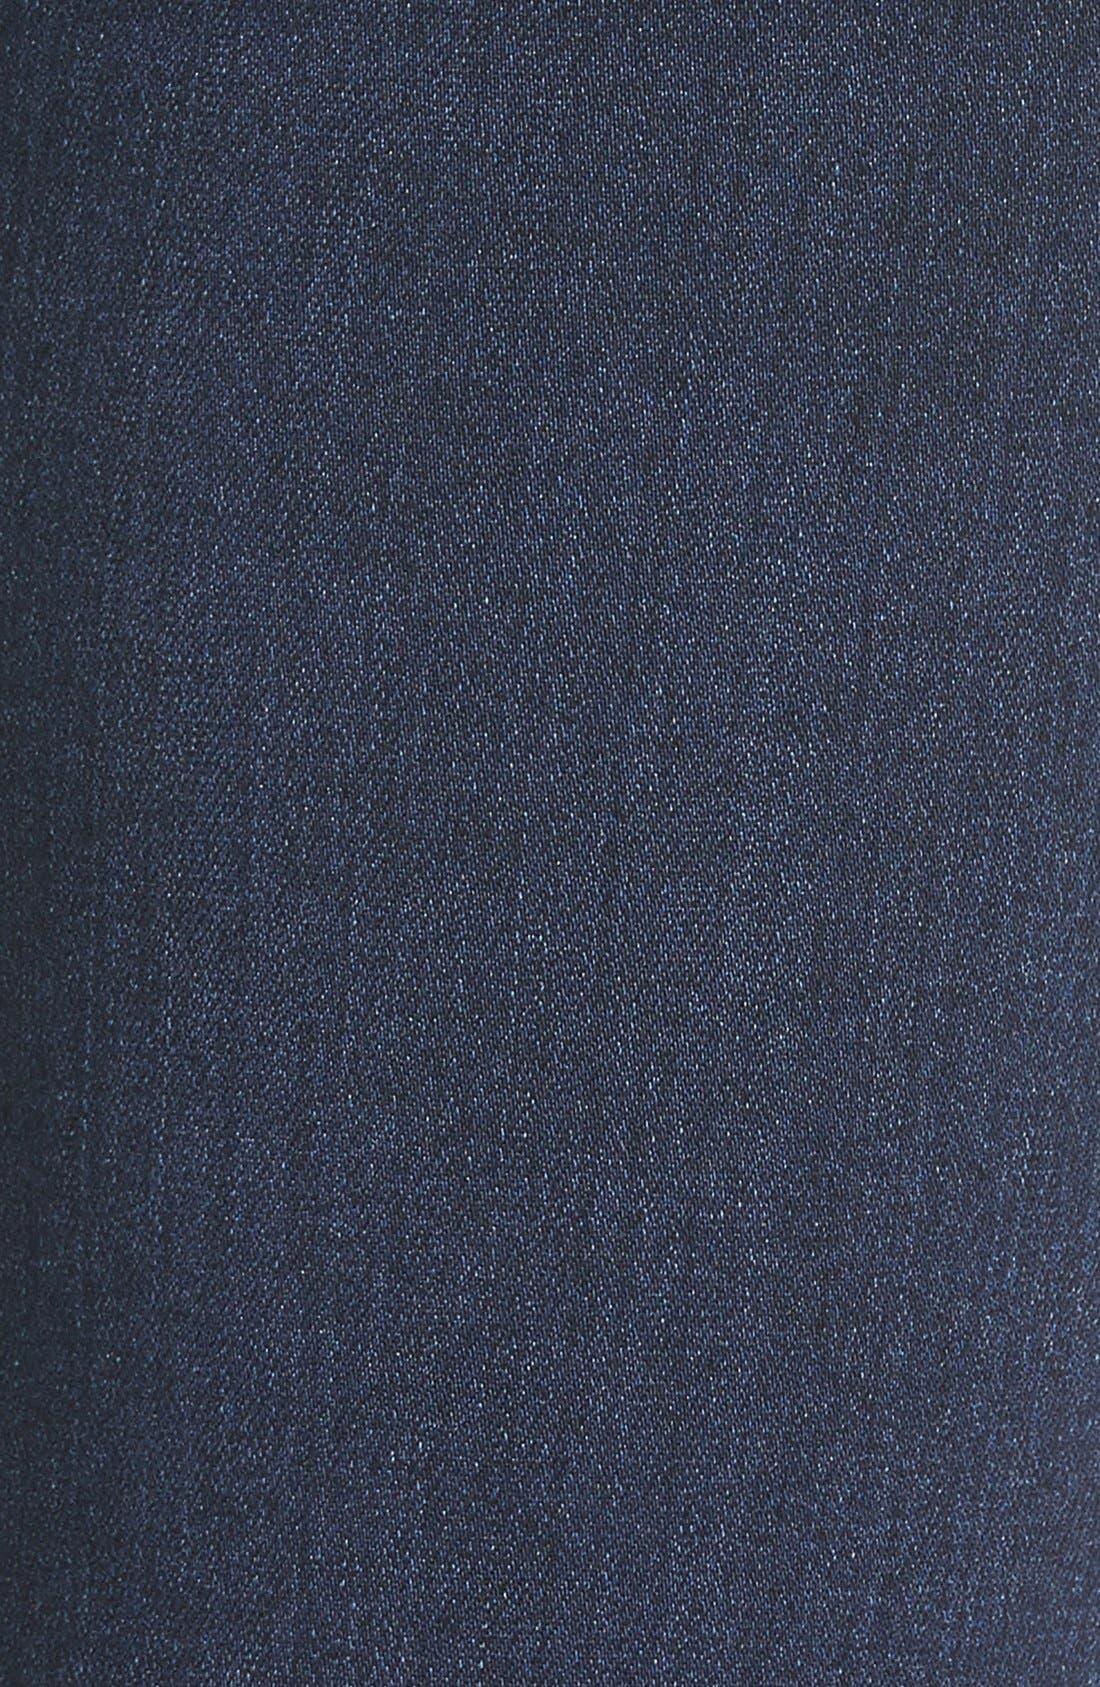 Transcend Skyline Skinny Jeans,                             Alternate thumbnail 8, color,                             400